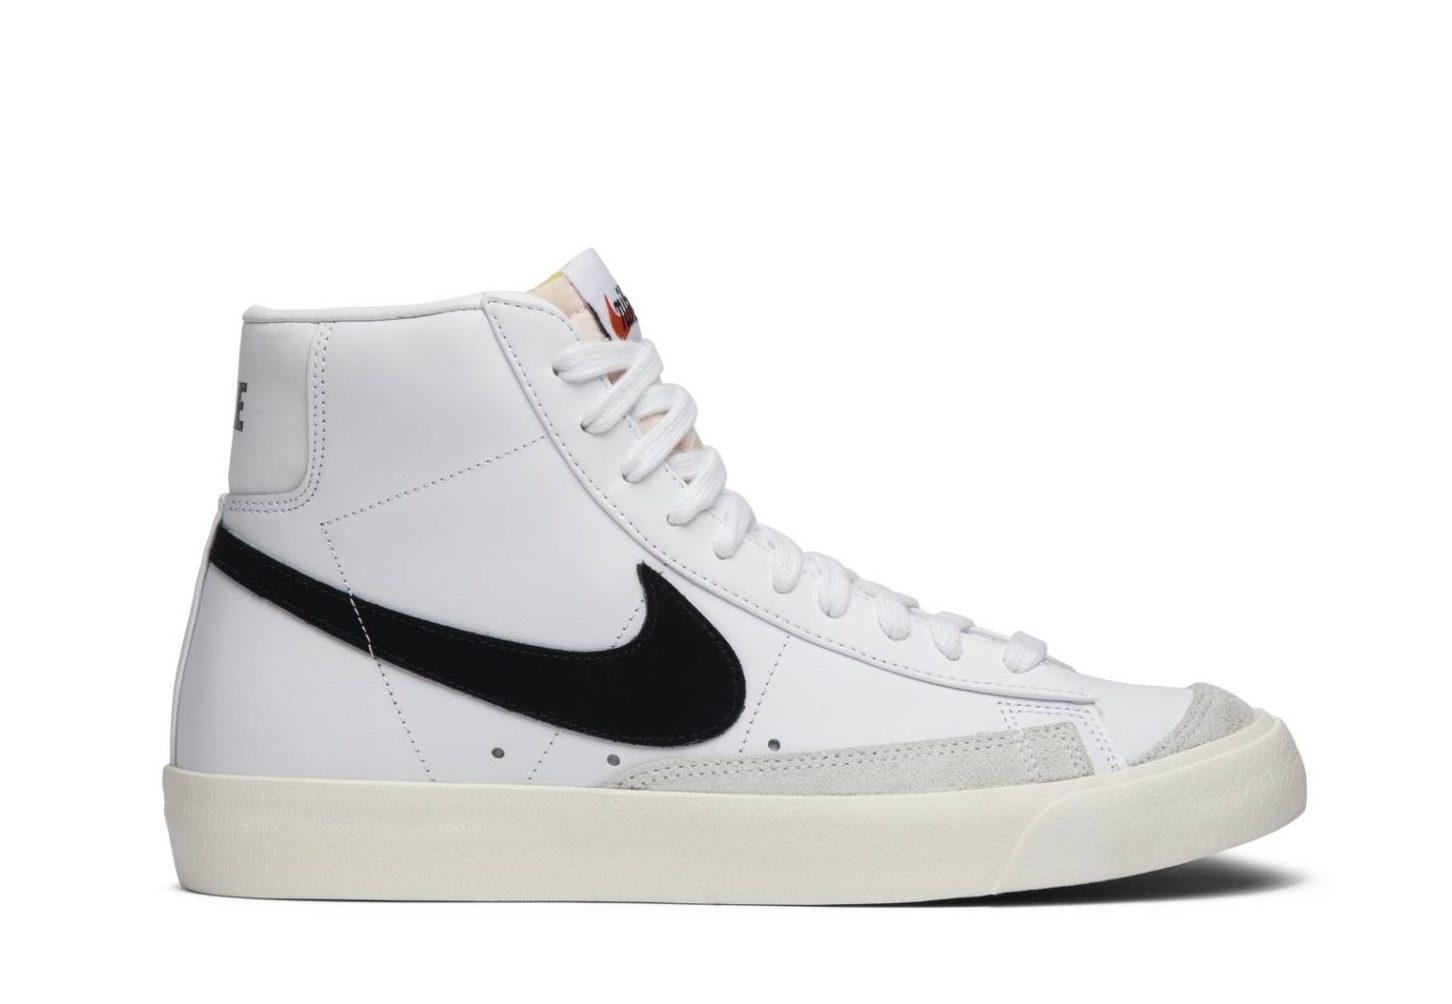 1Krossovki-Nike-Blazer-Mid-77-Vintage-White-Black-2-scaled-e1625782702891